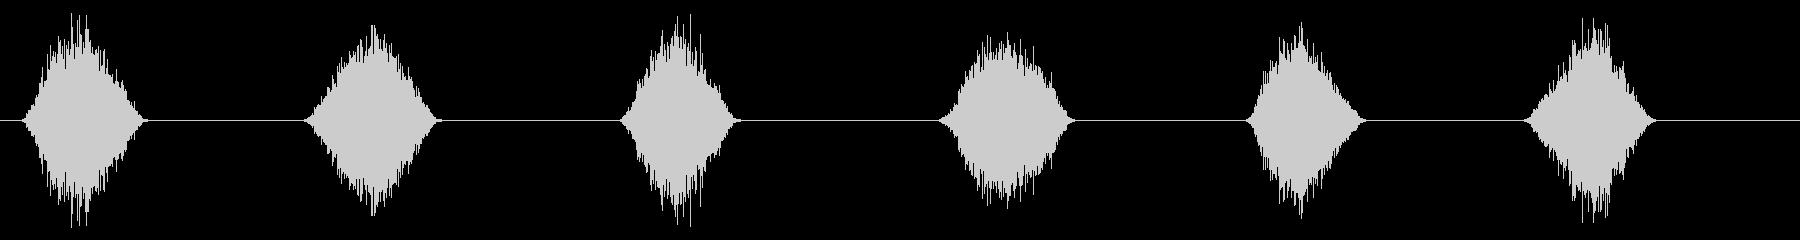 PC マウス ムーブ04-08(ソフト)の未再生の波形